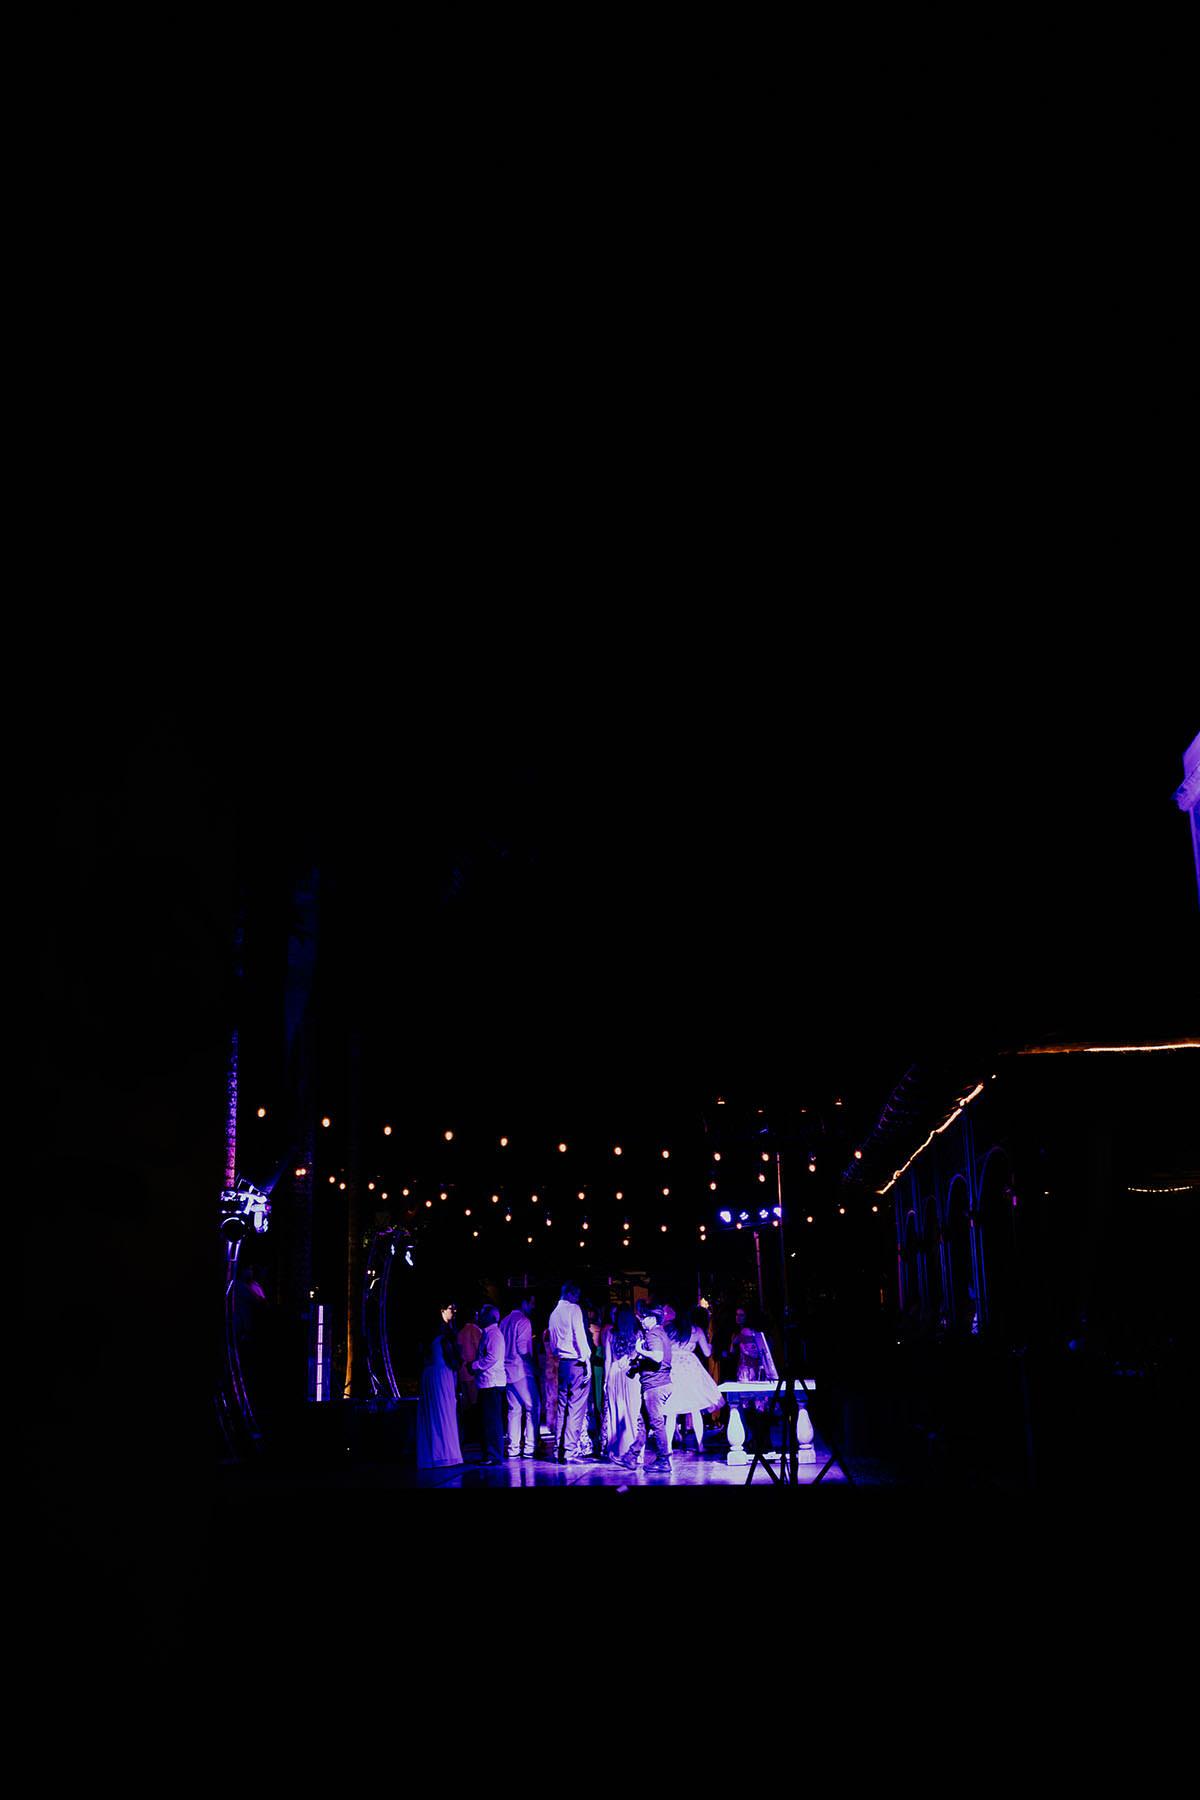 la-hacienda-xcanatun-wedding-merida-mexico-195.jpg